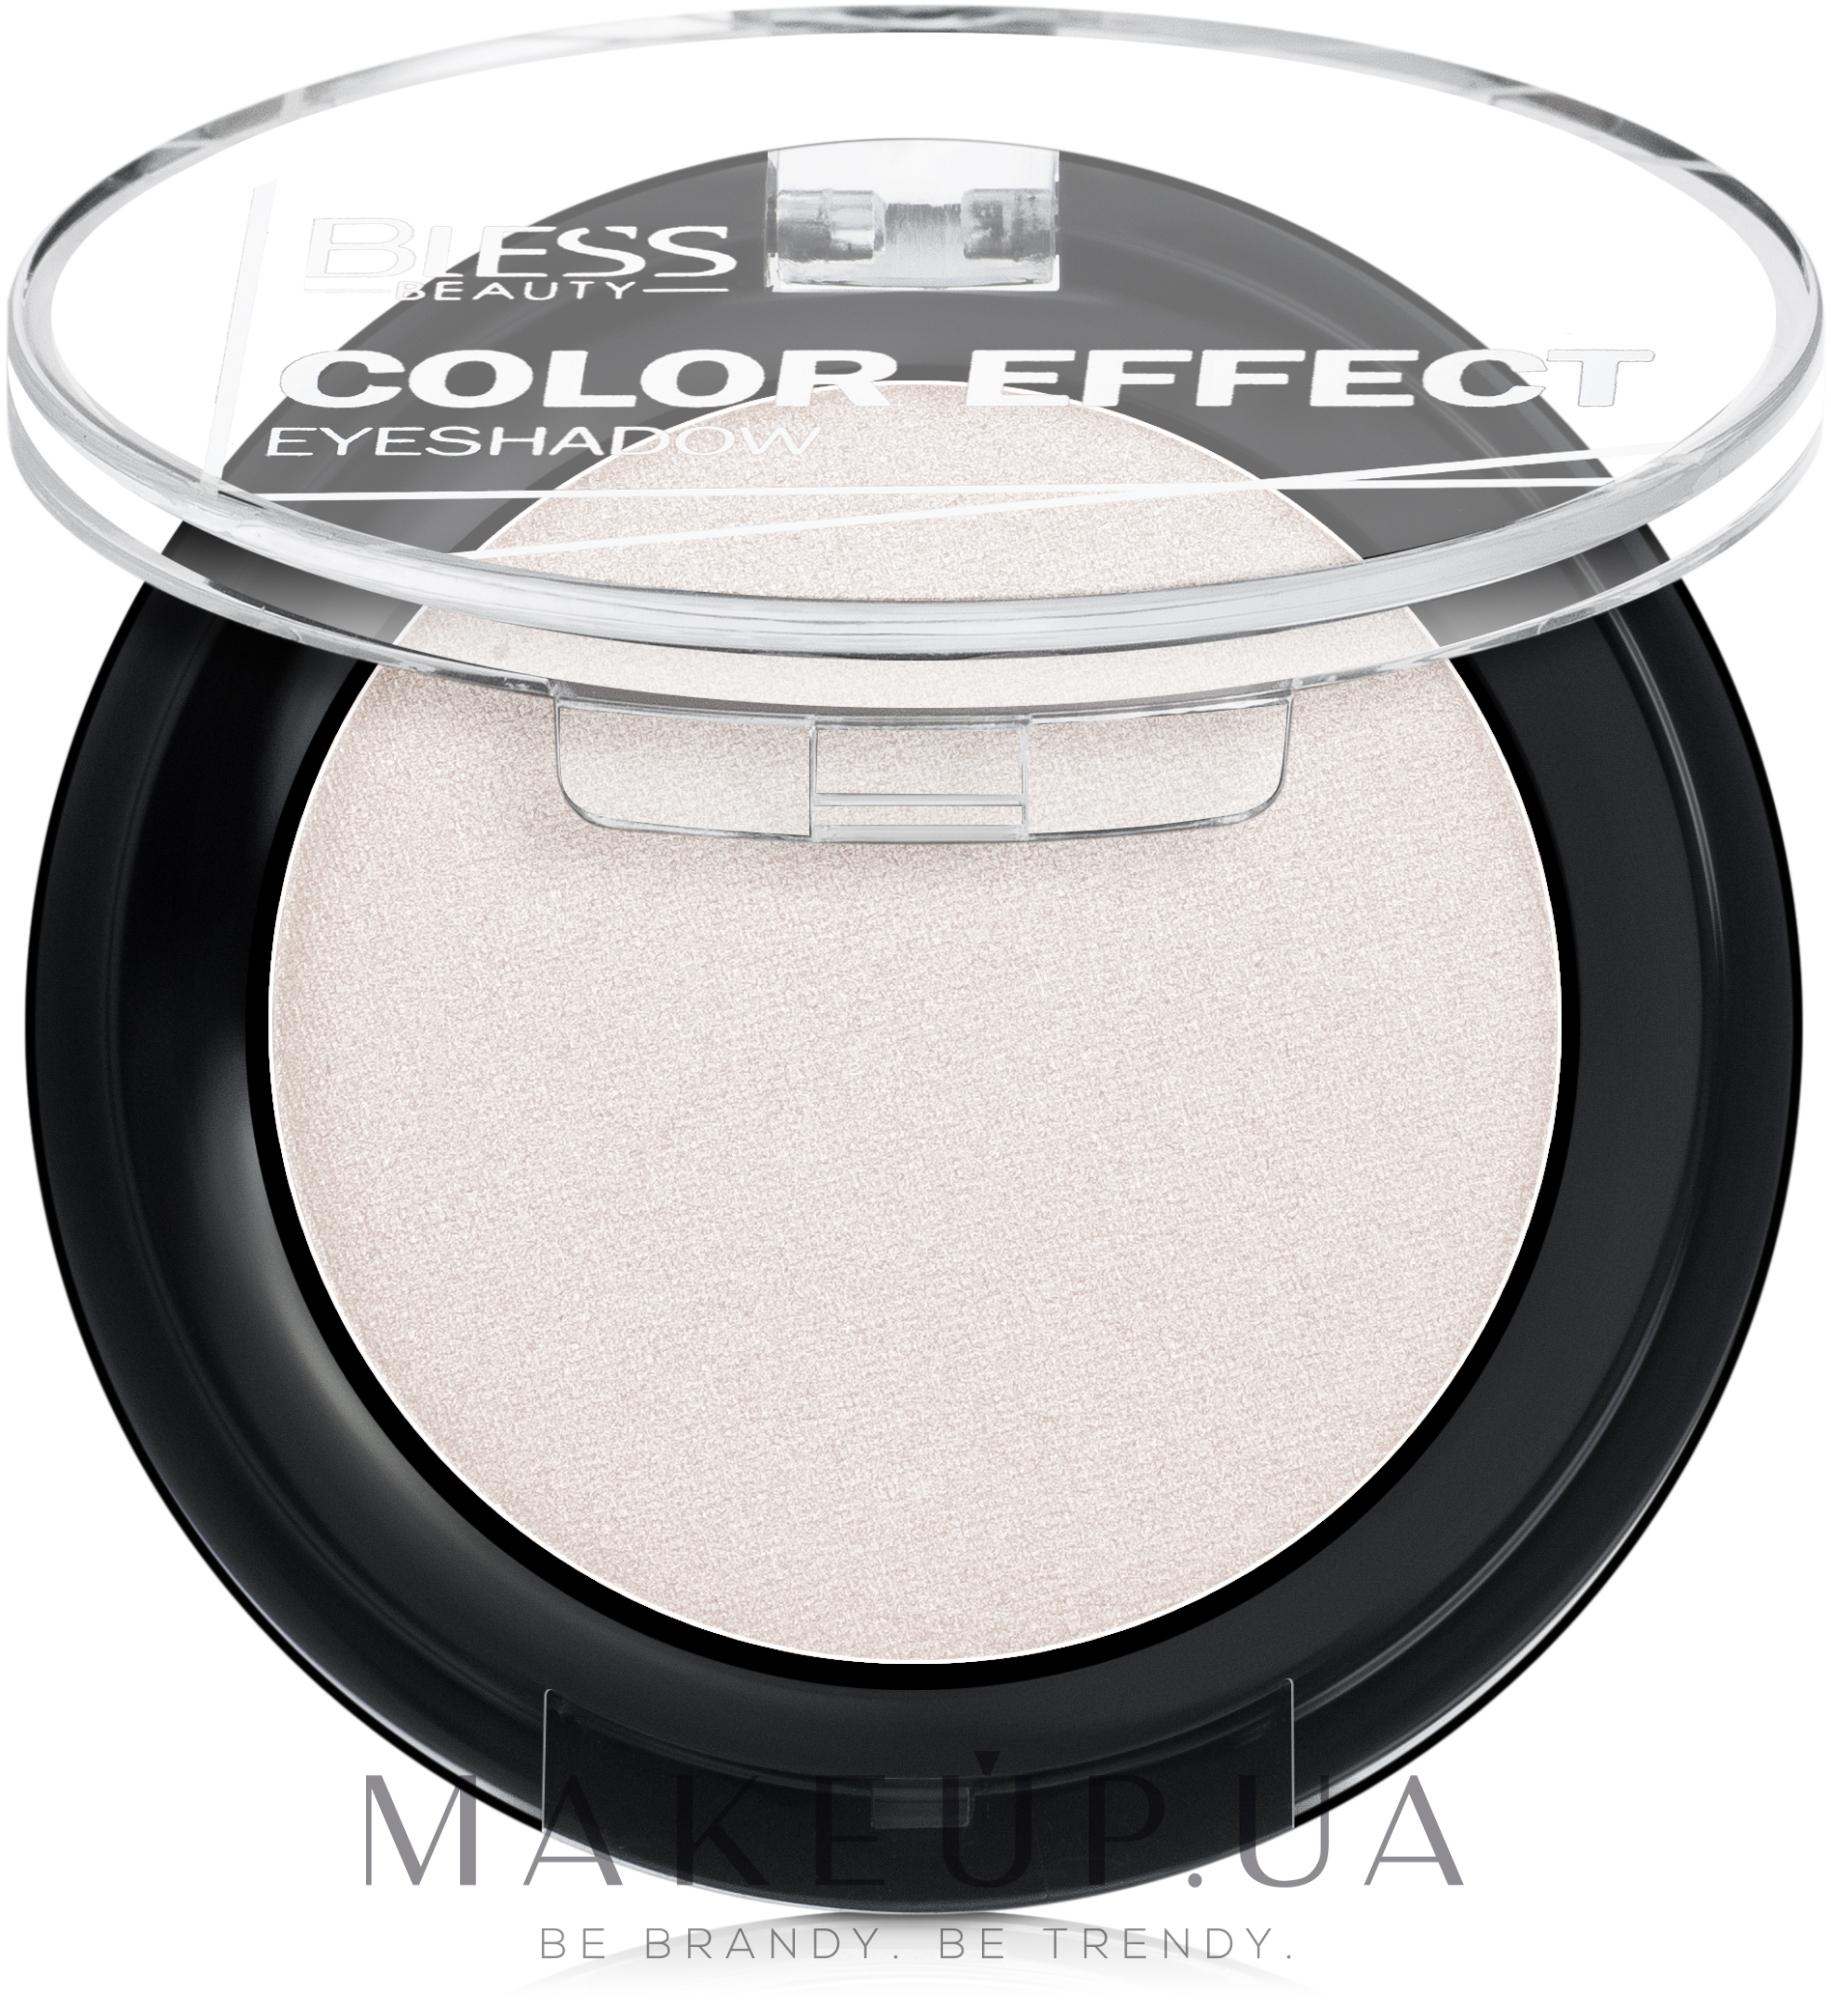 Моно тени для век - Bless Beauty Color Effect Eyeshadows — фото 01